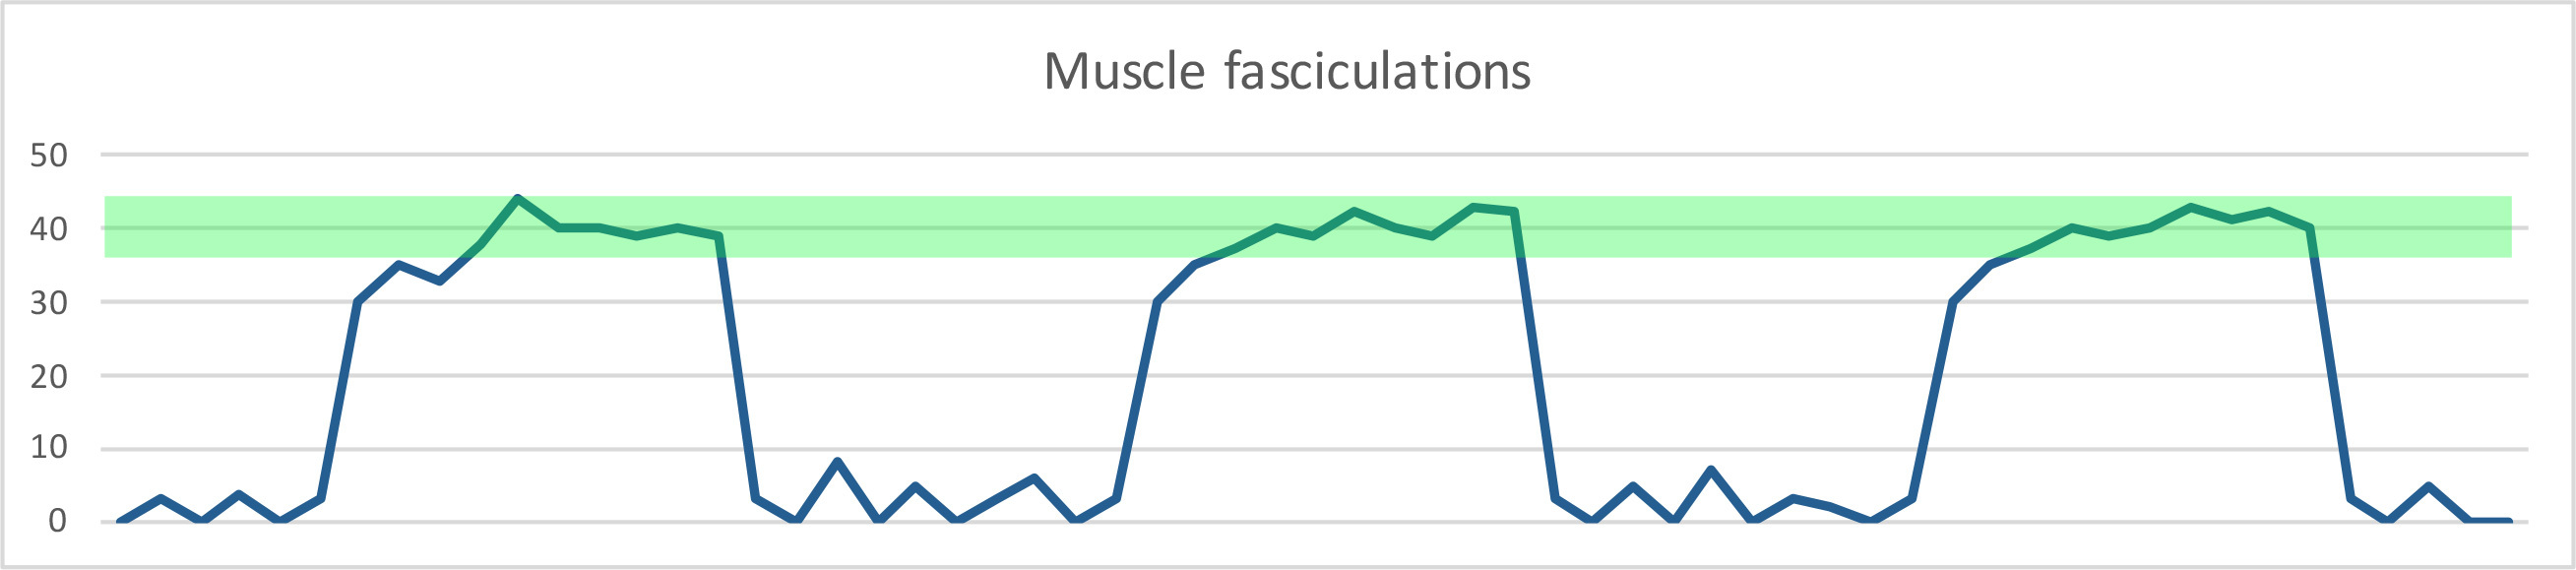 muscle-fasciculations.jpg#asset:3118